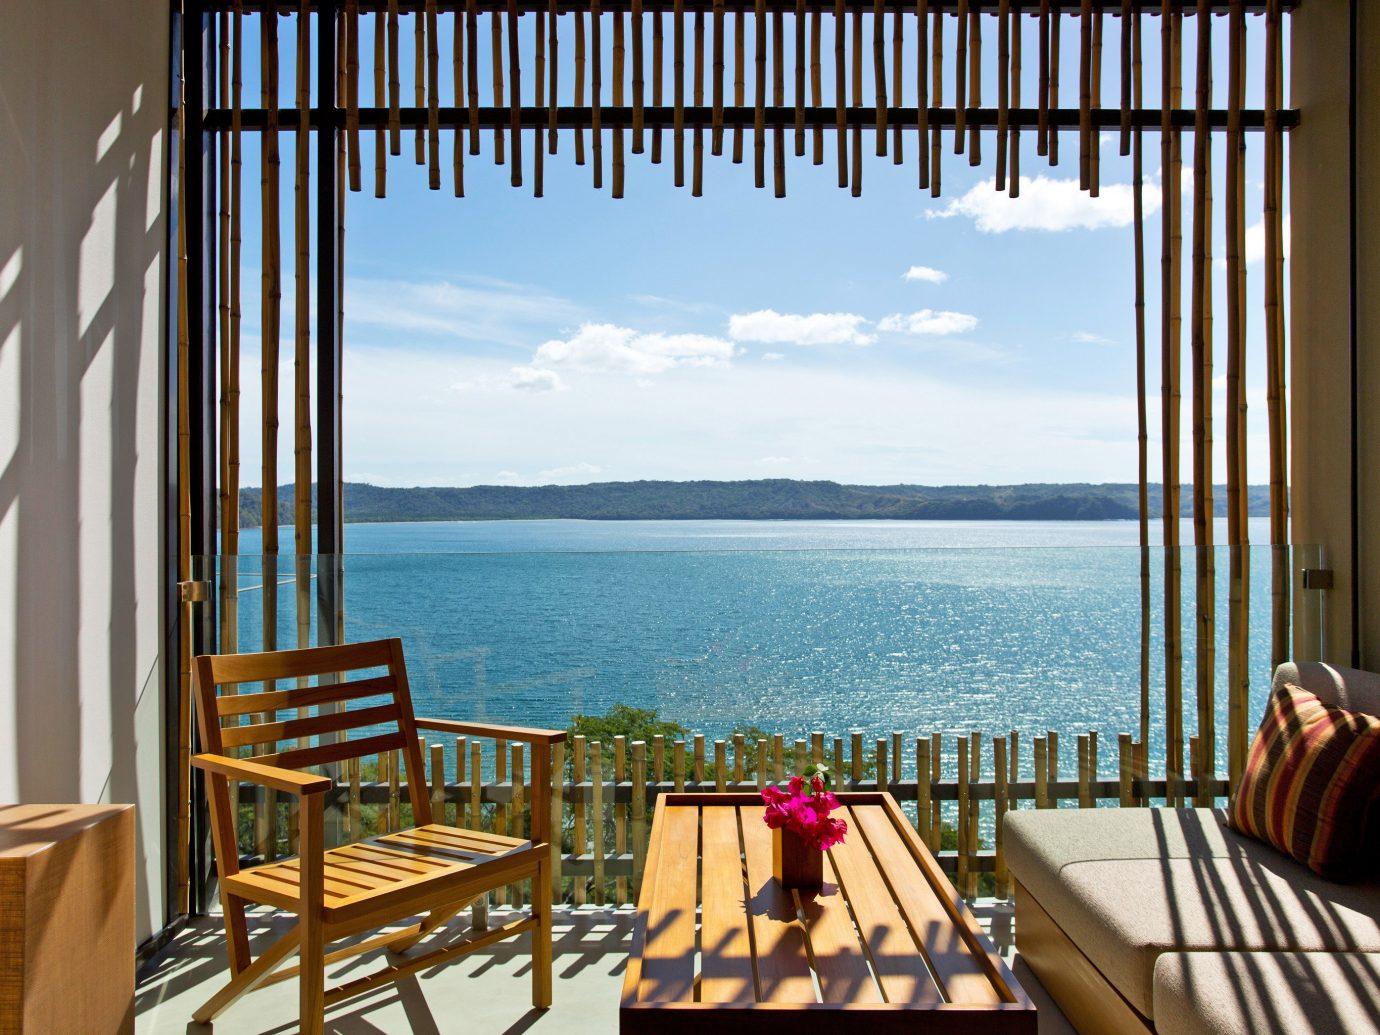 Deck Hotels Modern Resort Scenic views water chair property cottage overlooking Villa